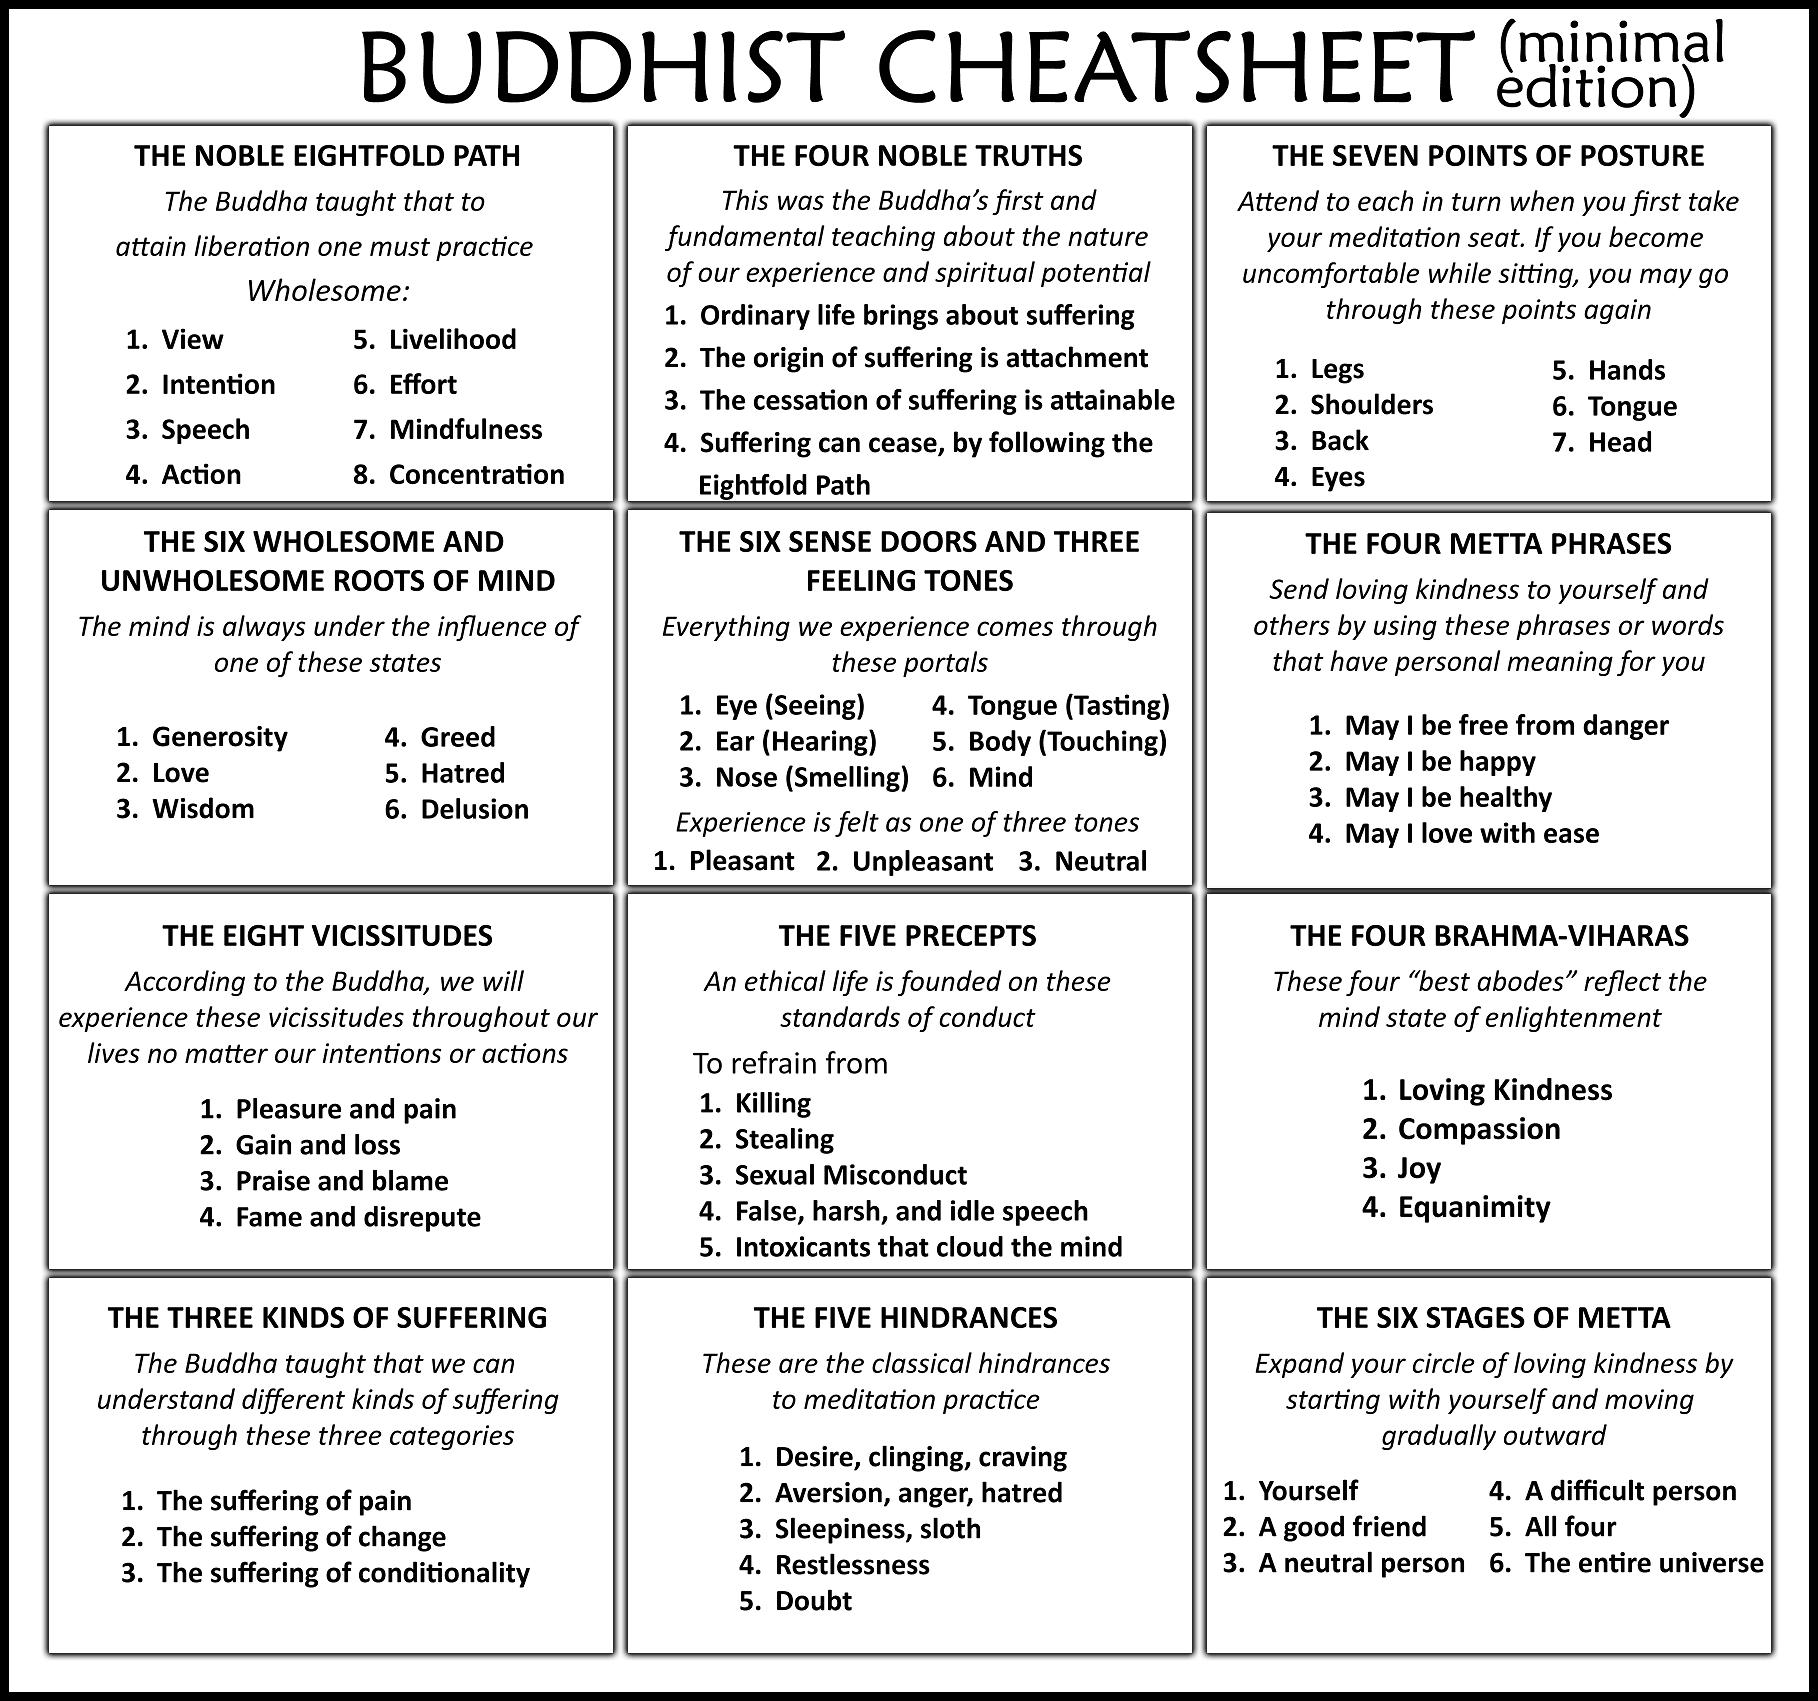 A Cheat Sheet To Buddhist Philosophy